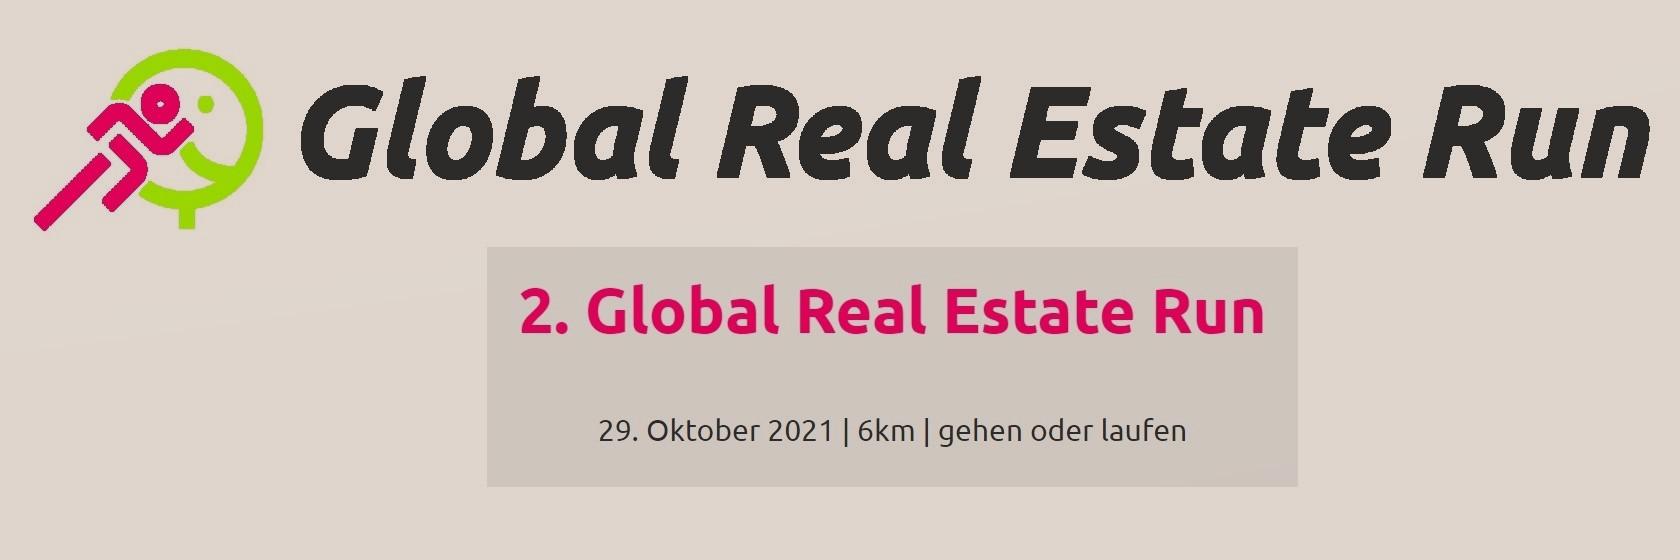 Jetzt teilnehmen am Global Real Estate Run 2021!